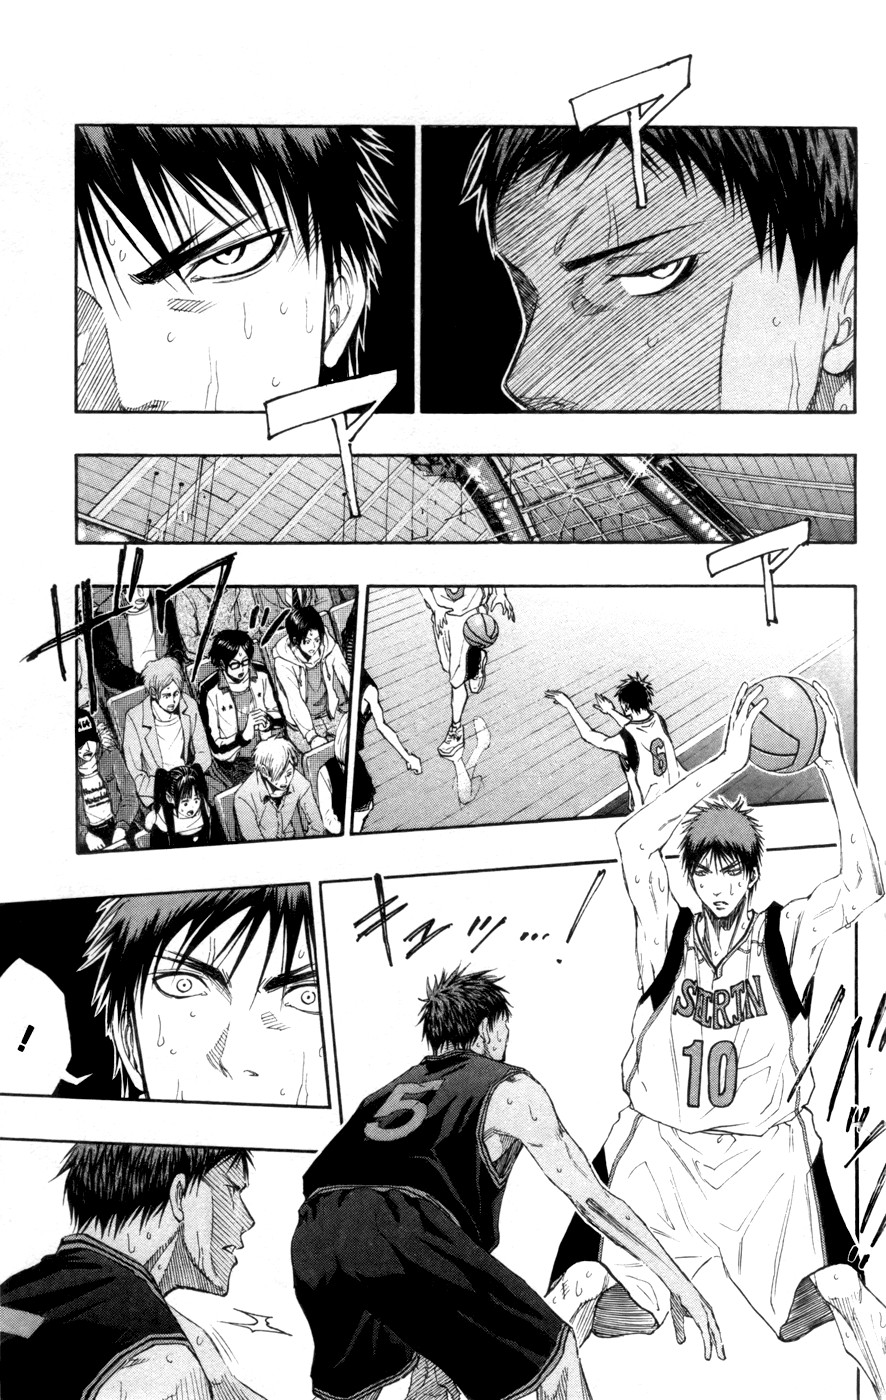 Kuroko no Basket Manga Chapter 121 - Image 03